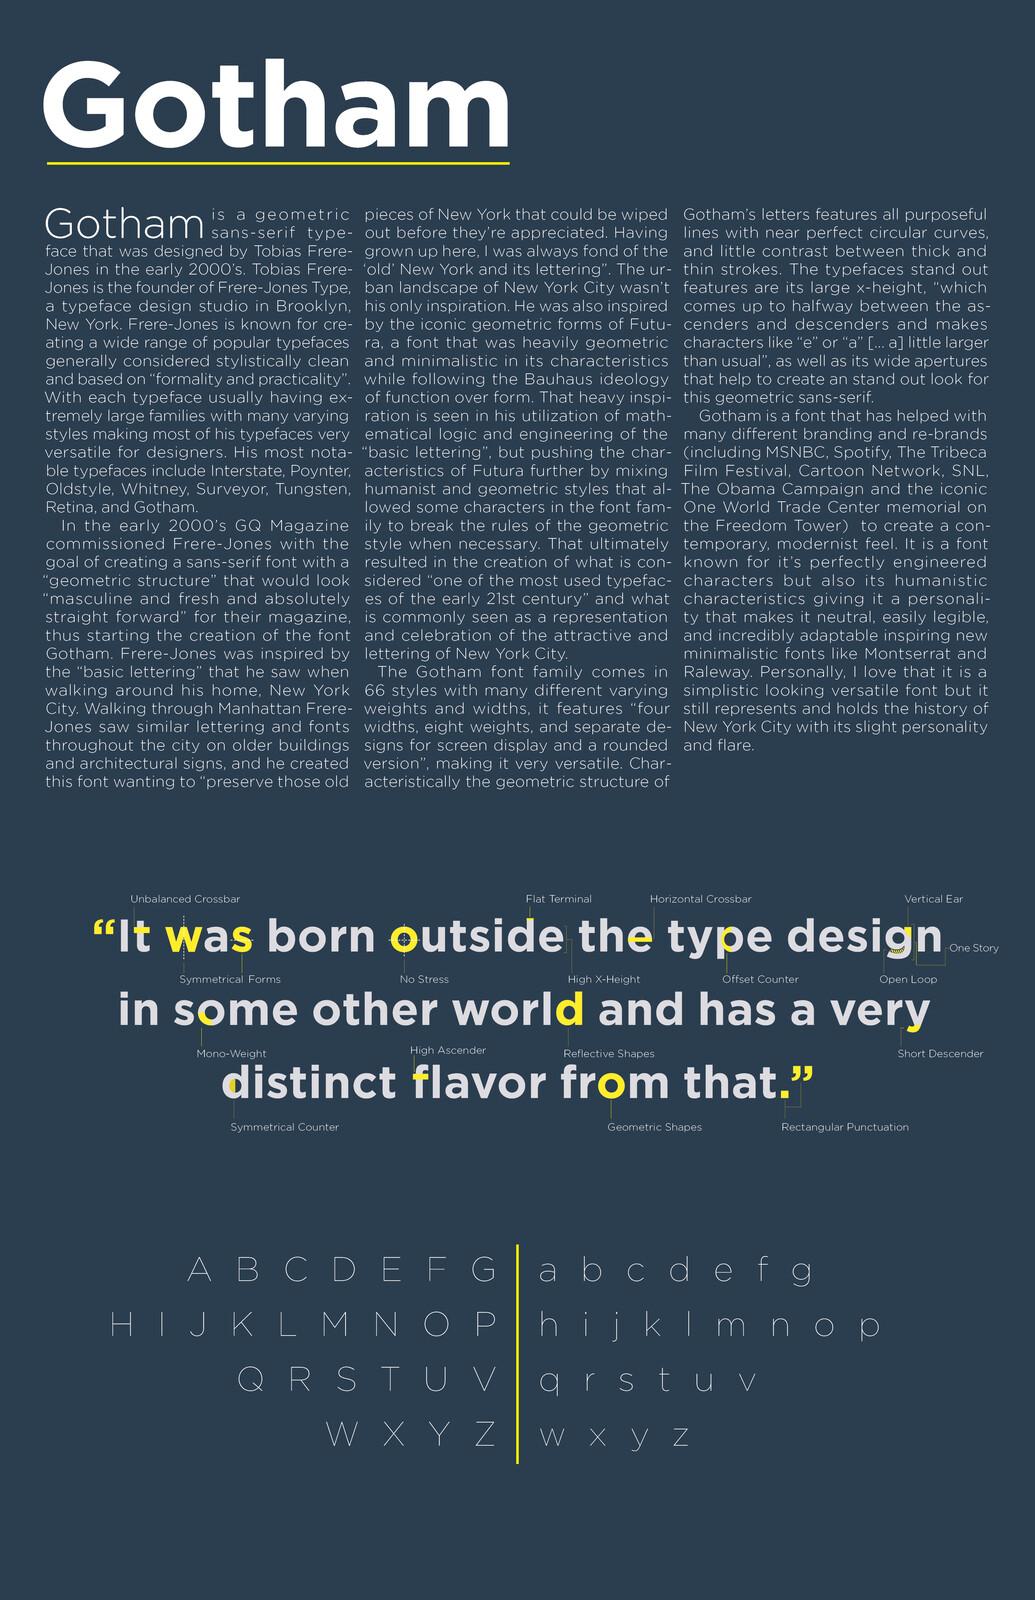 Gotham Typeface Study